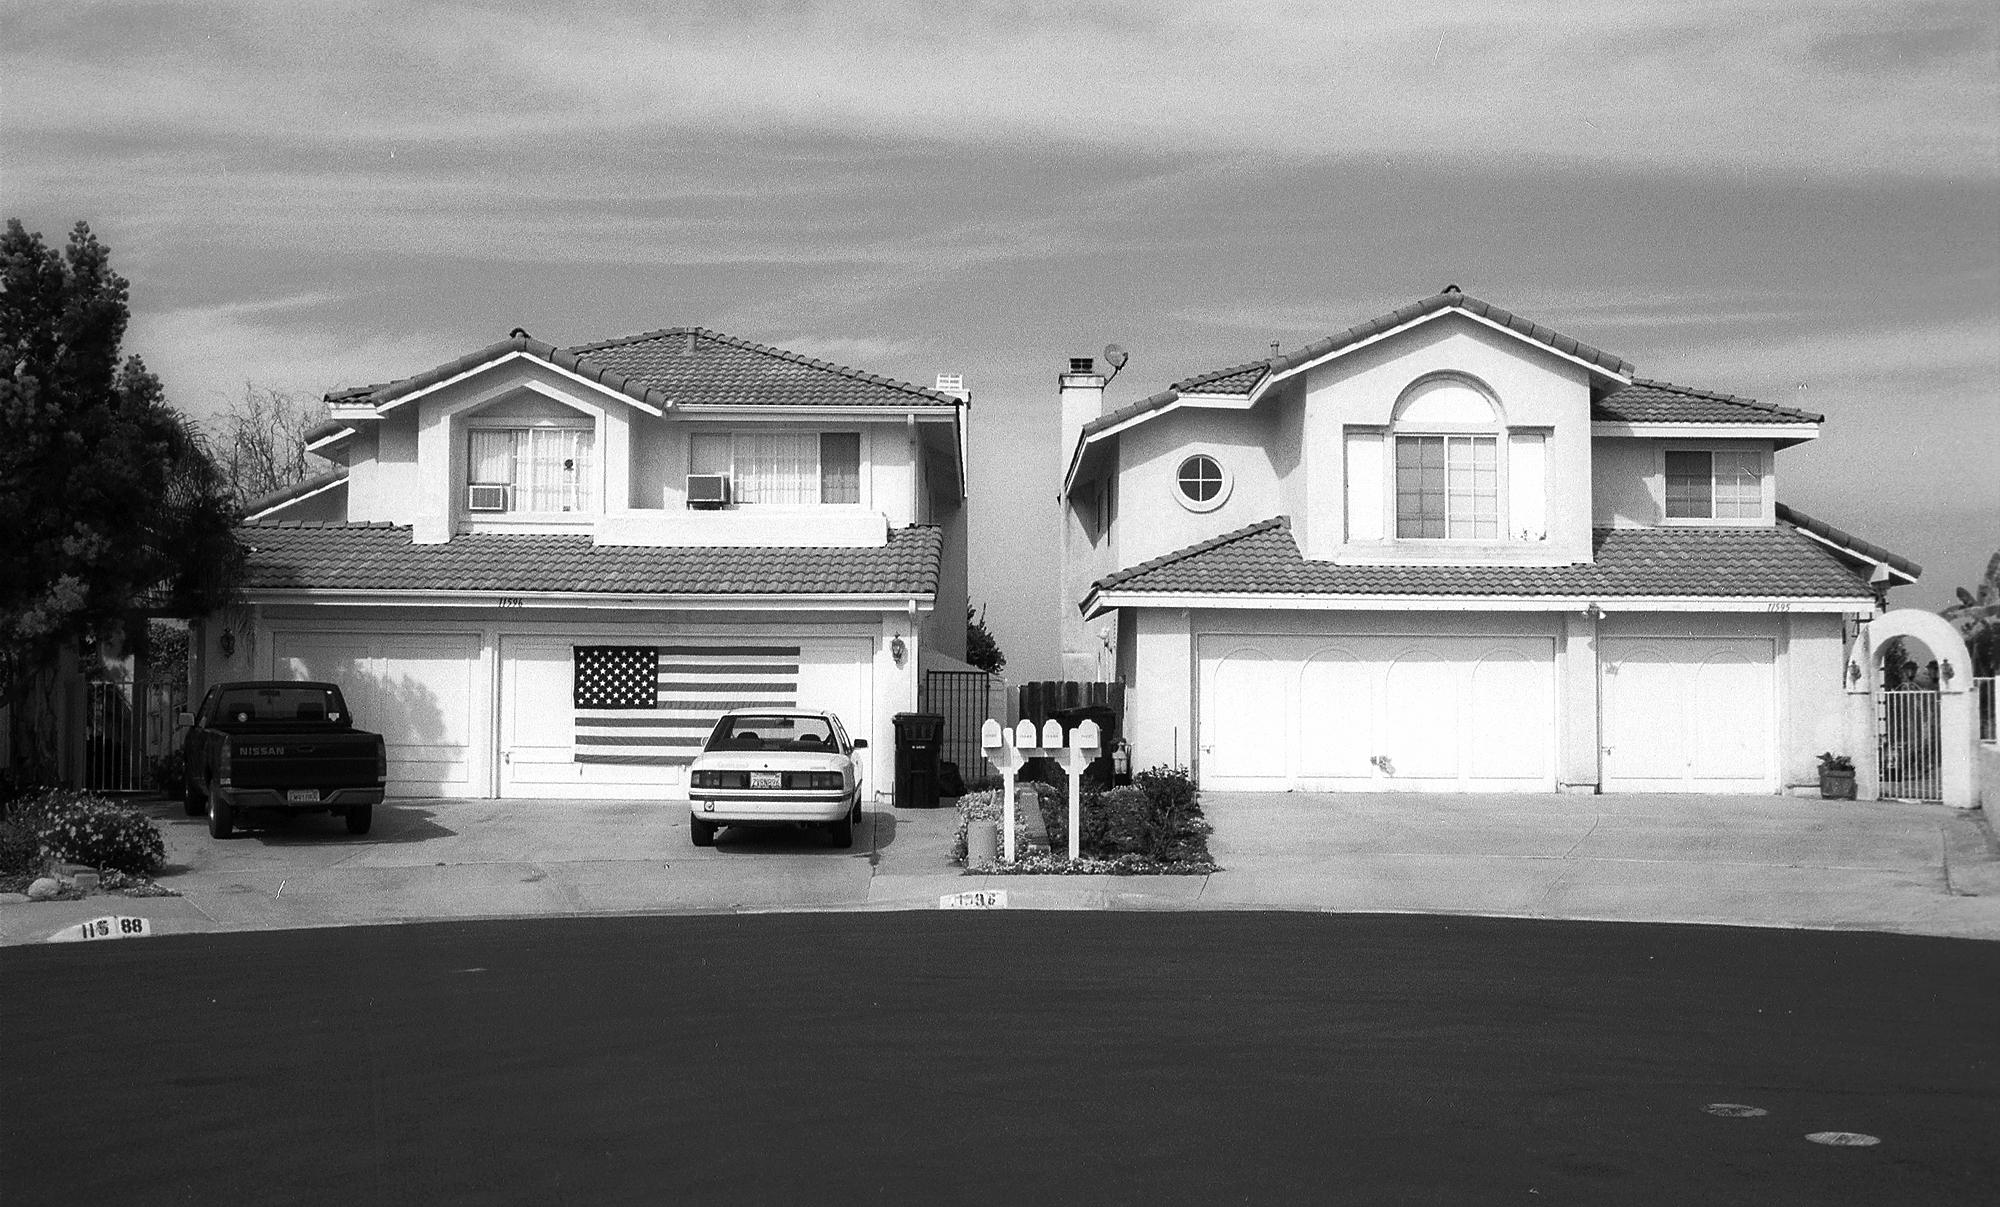 San Diego, California, 2002